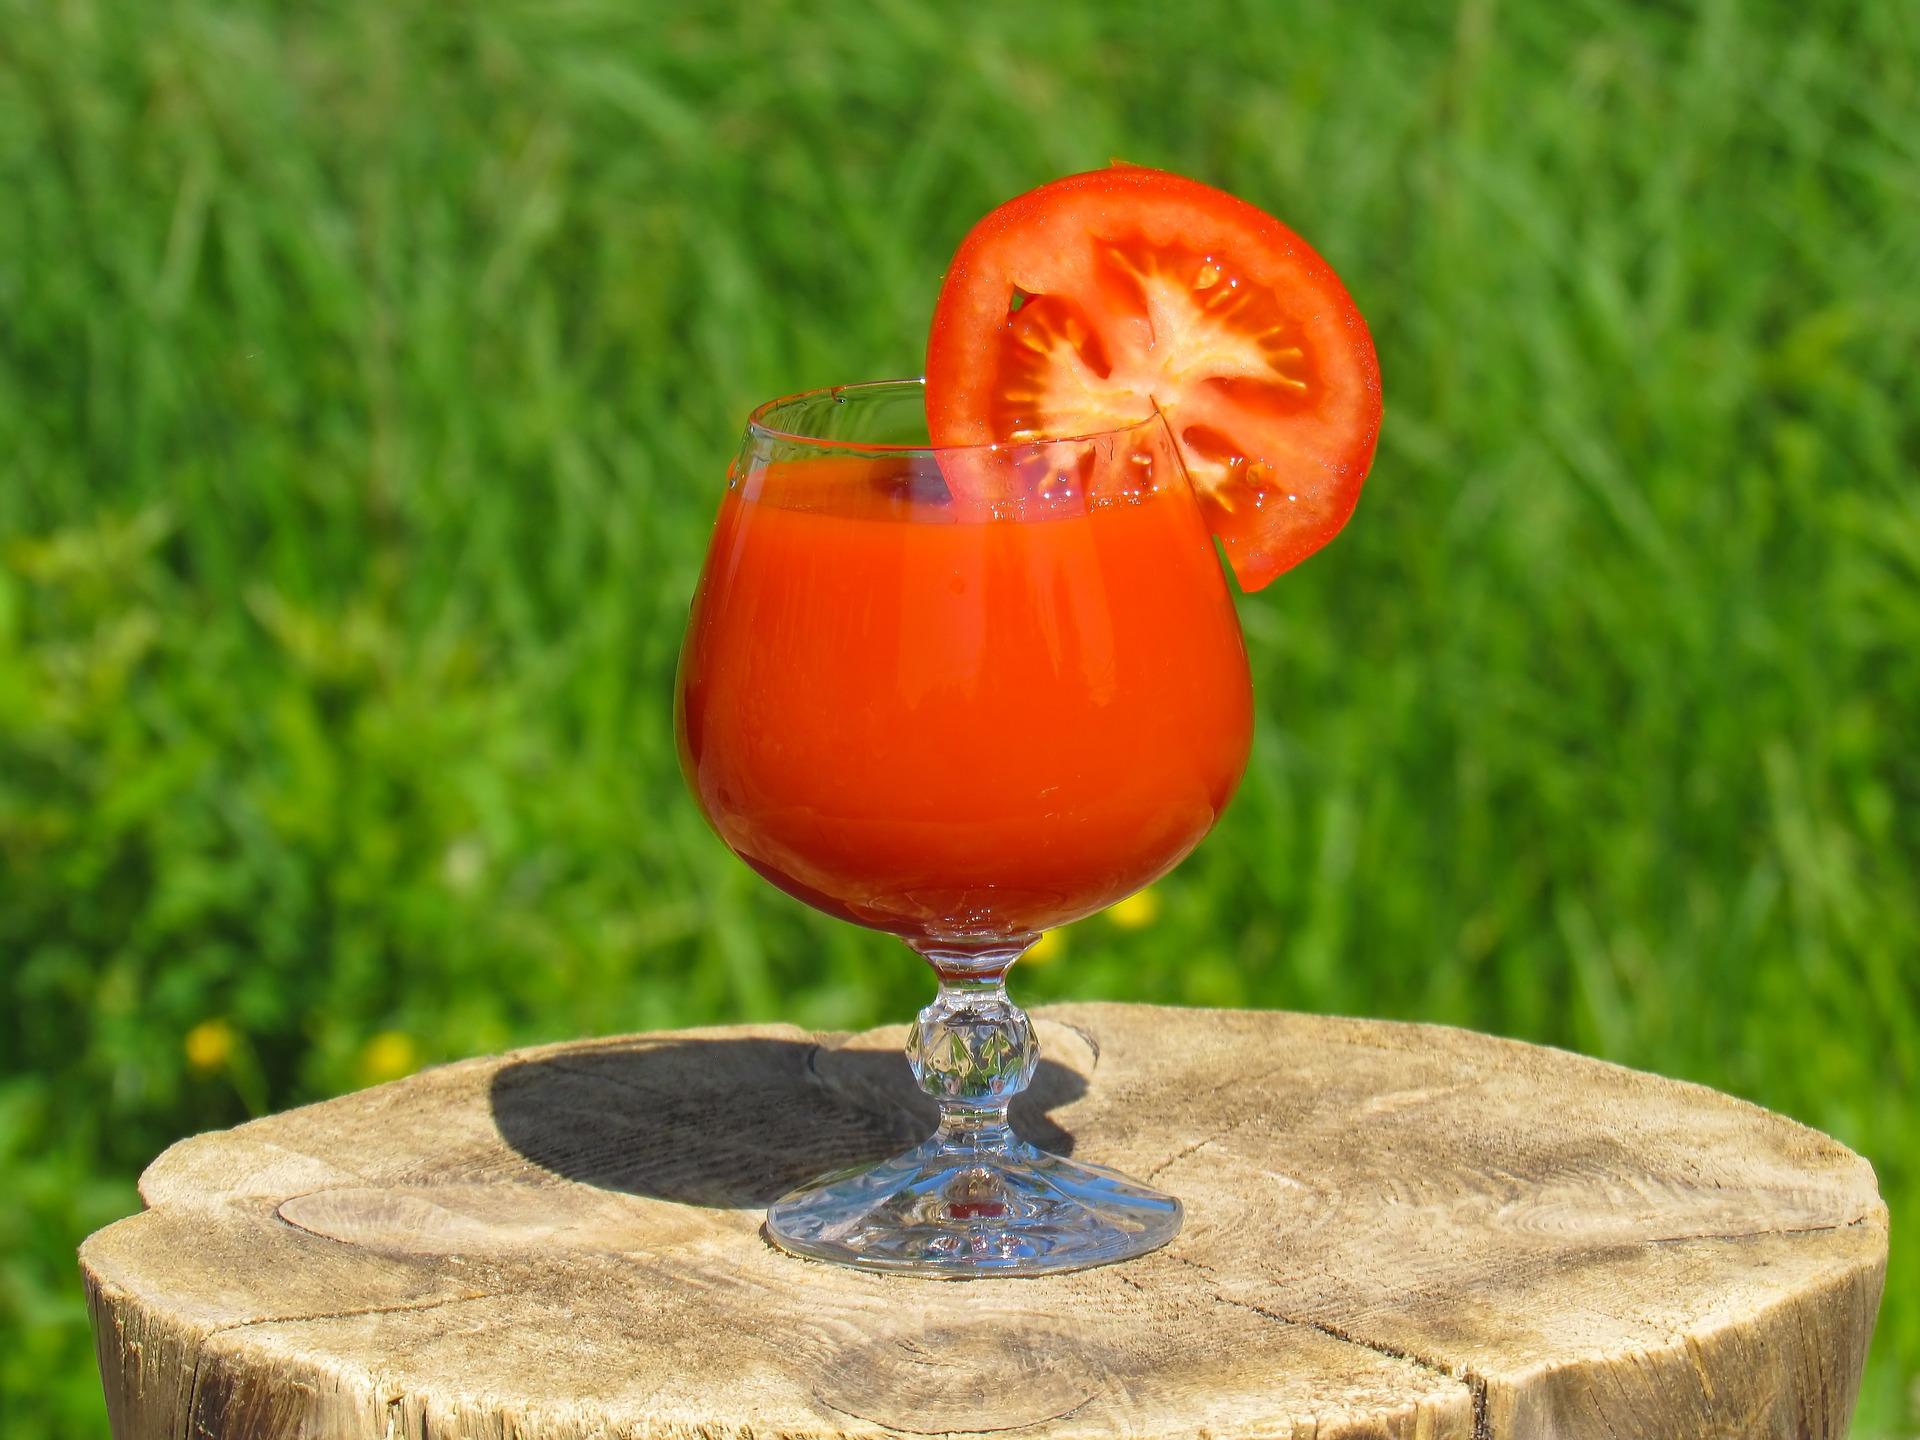 Tomato summer-3219326_1920 (1).jpg